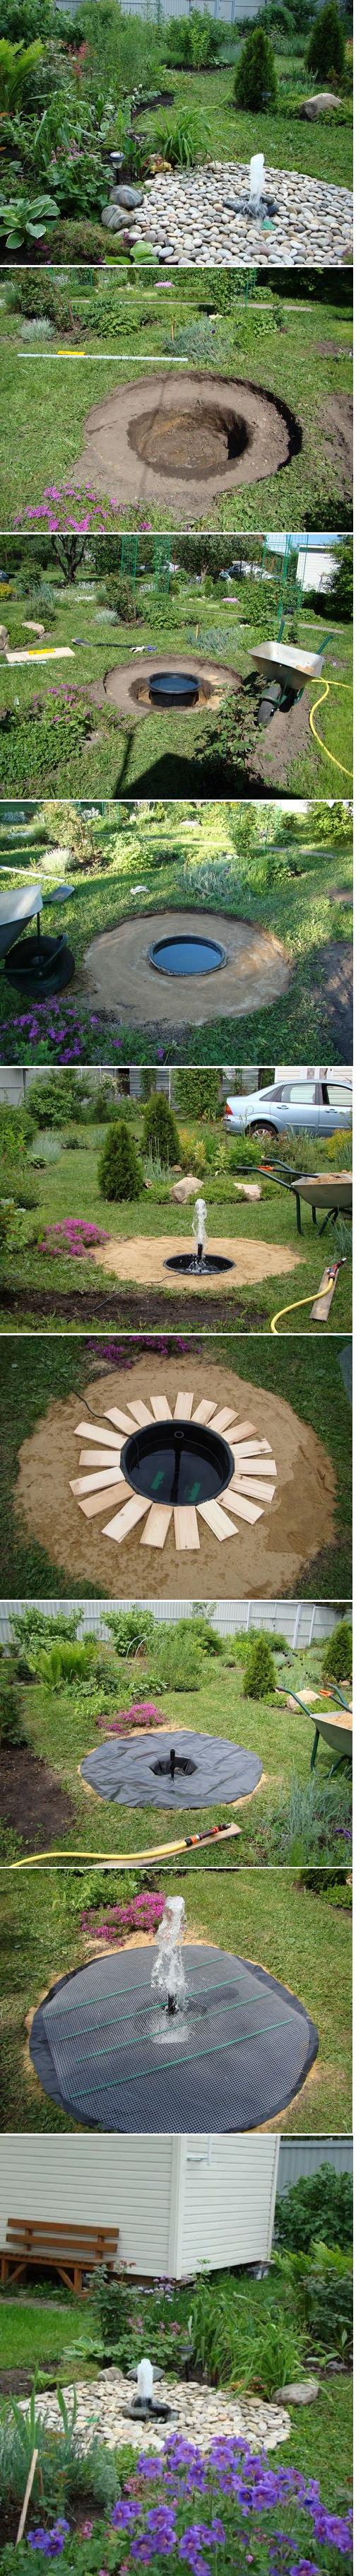 15 DIY How to Make Your Backyard Awesome Ideas 2 | Bury, Fountain ...